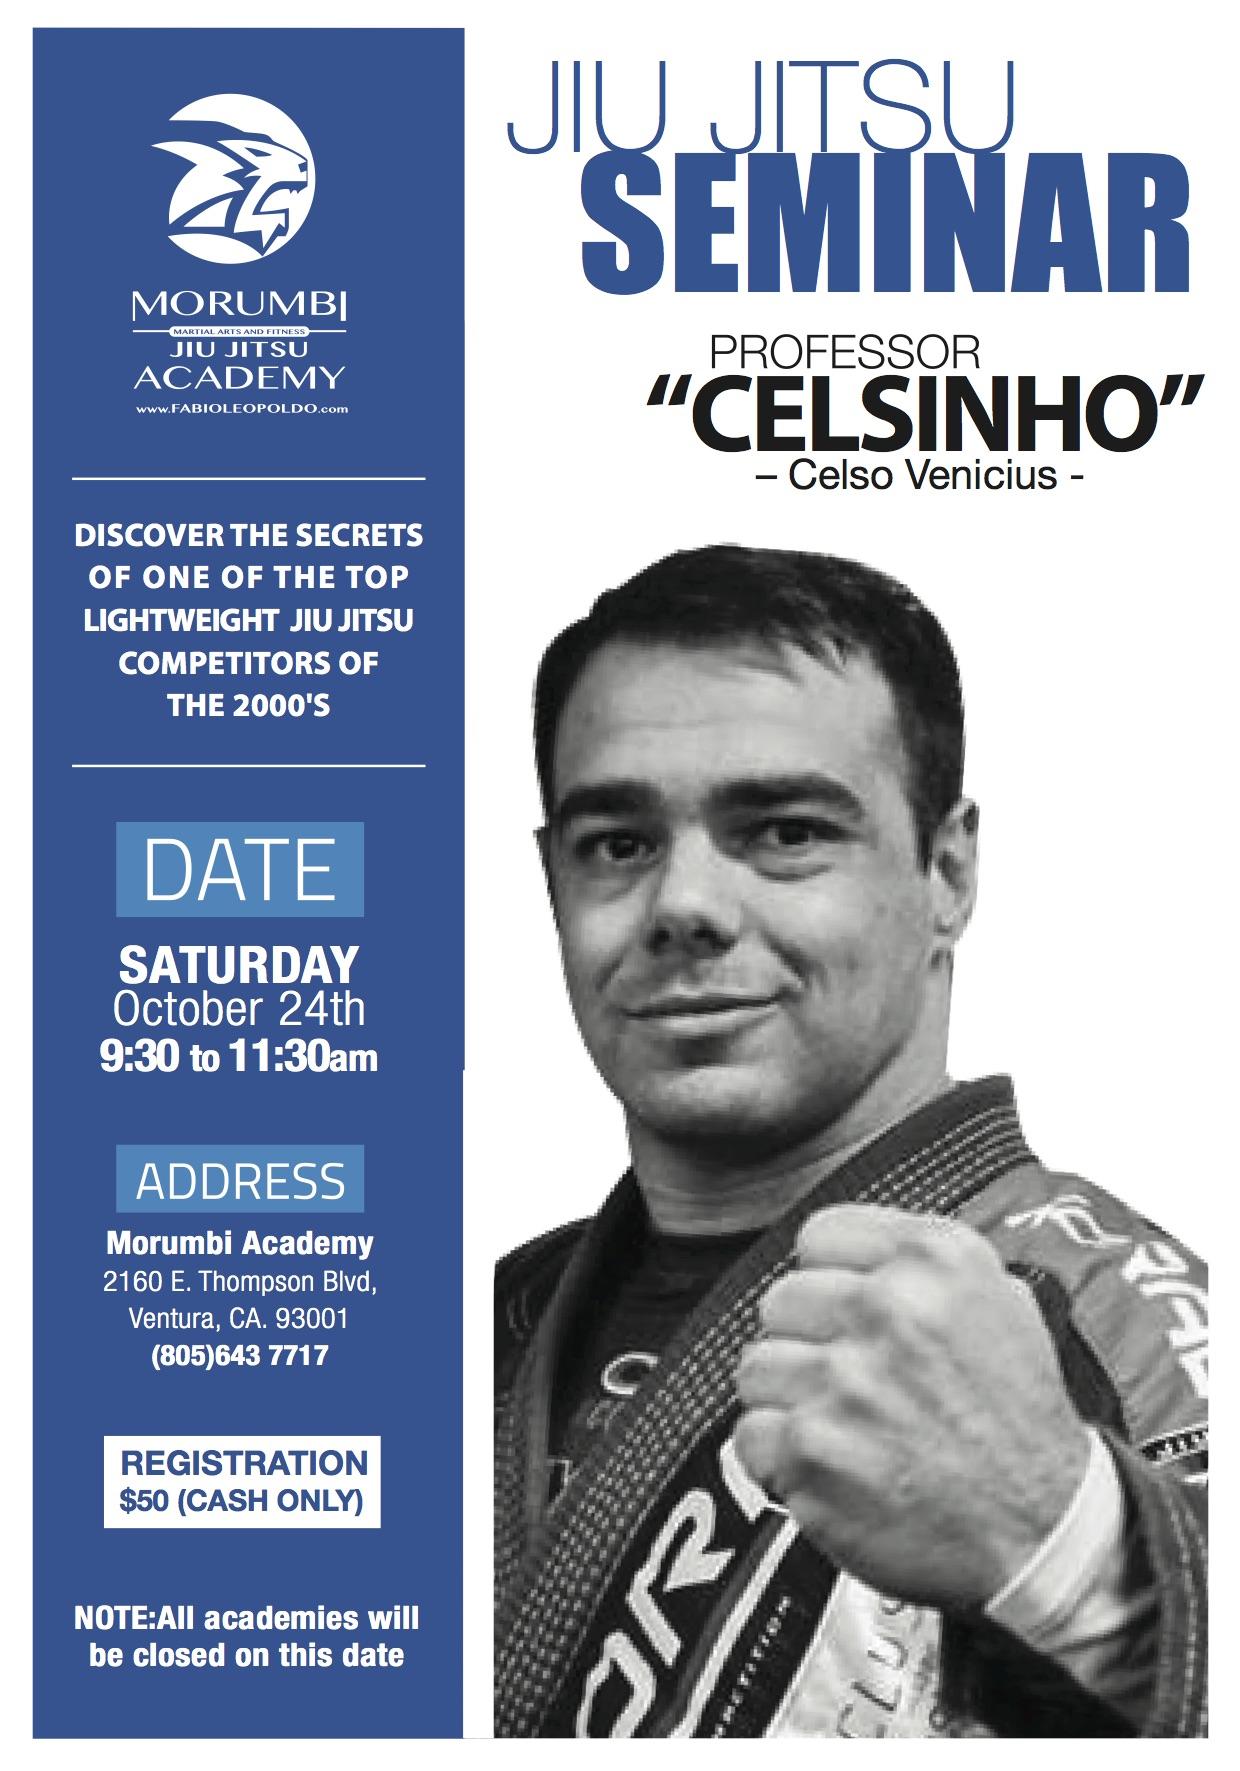 celso-vinicius-jiu-jitsu-seminar